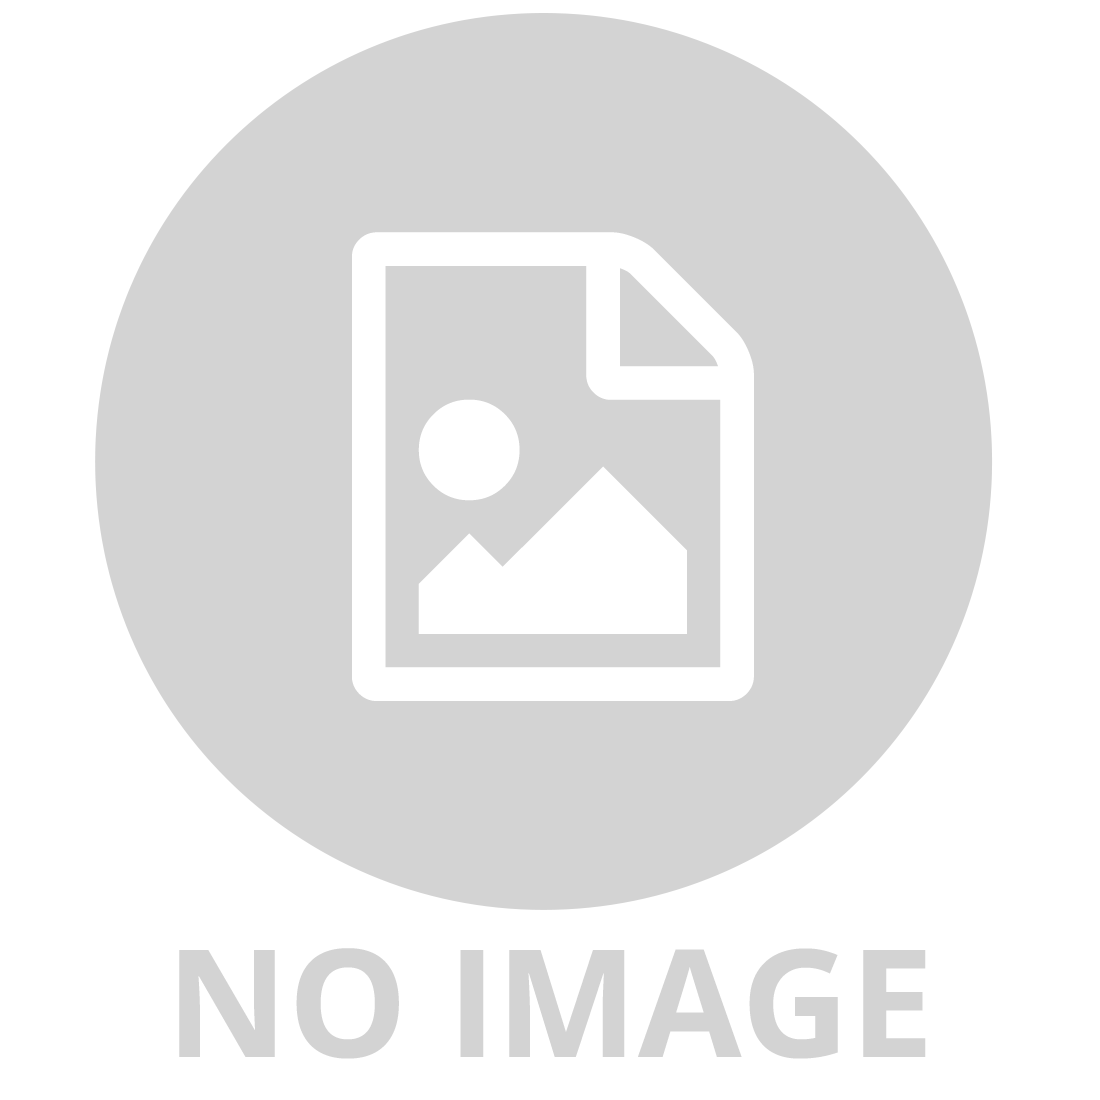 RAVENSBURGER 3D PUZZLE 72 PIECE TOY STORY 4